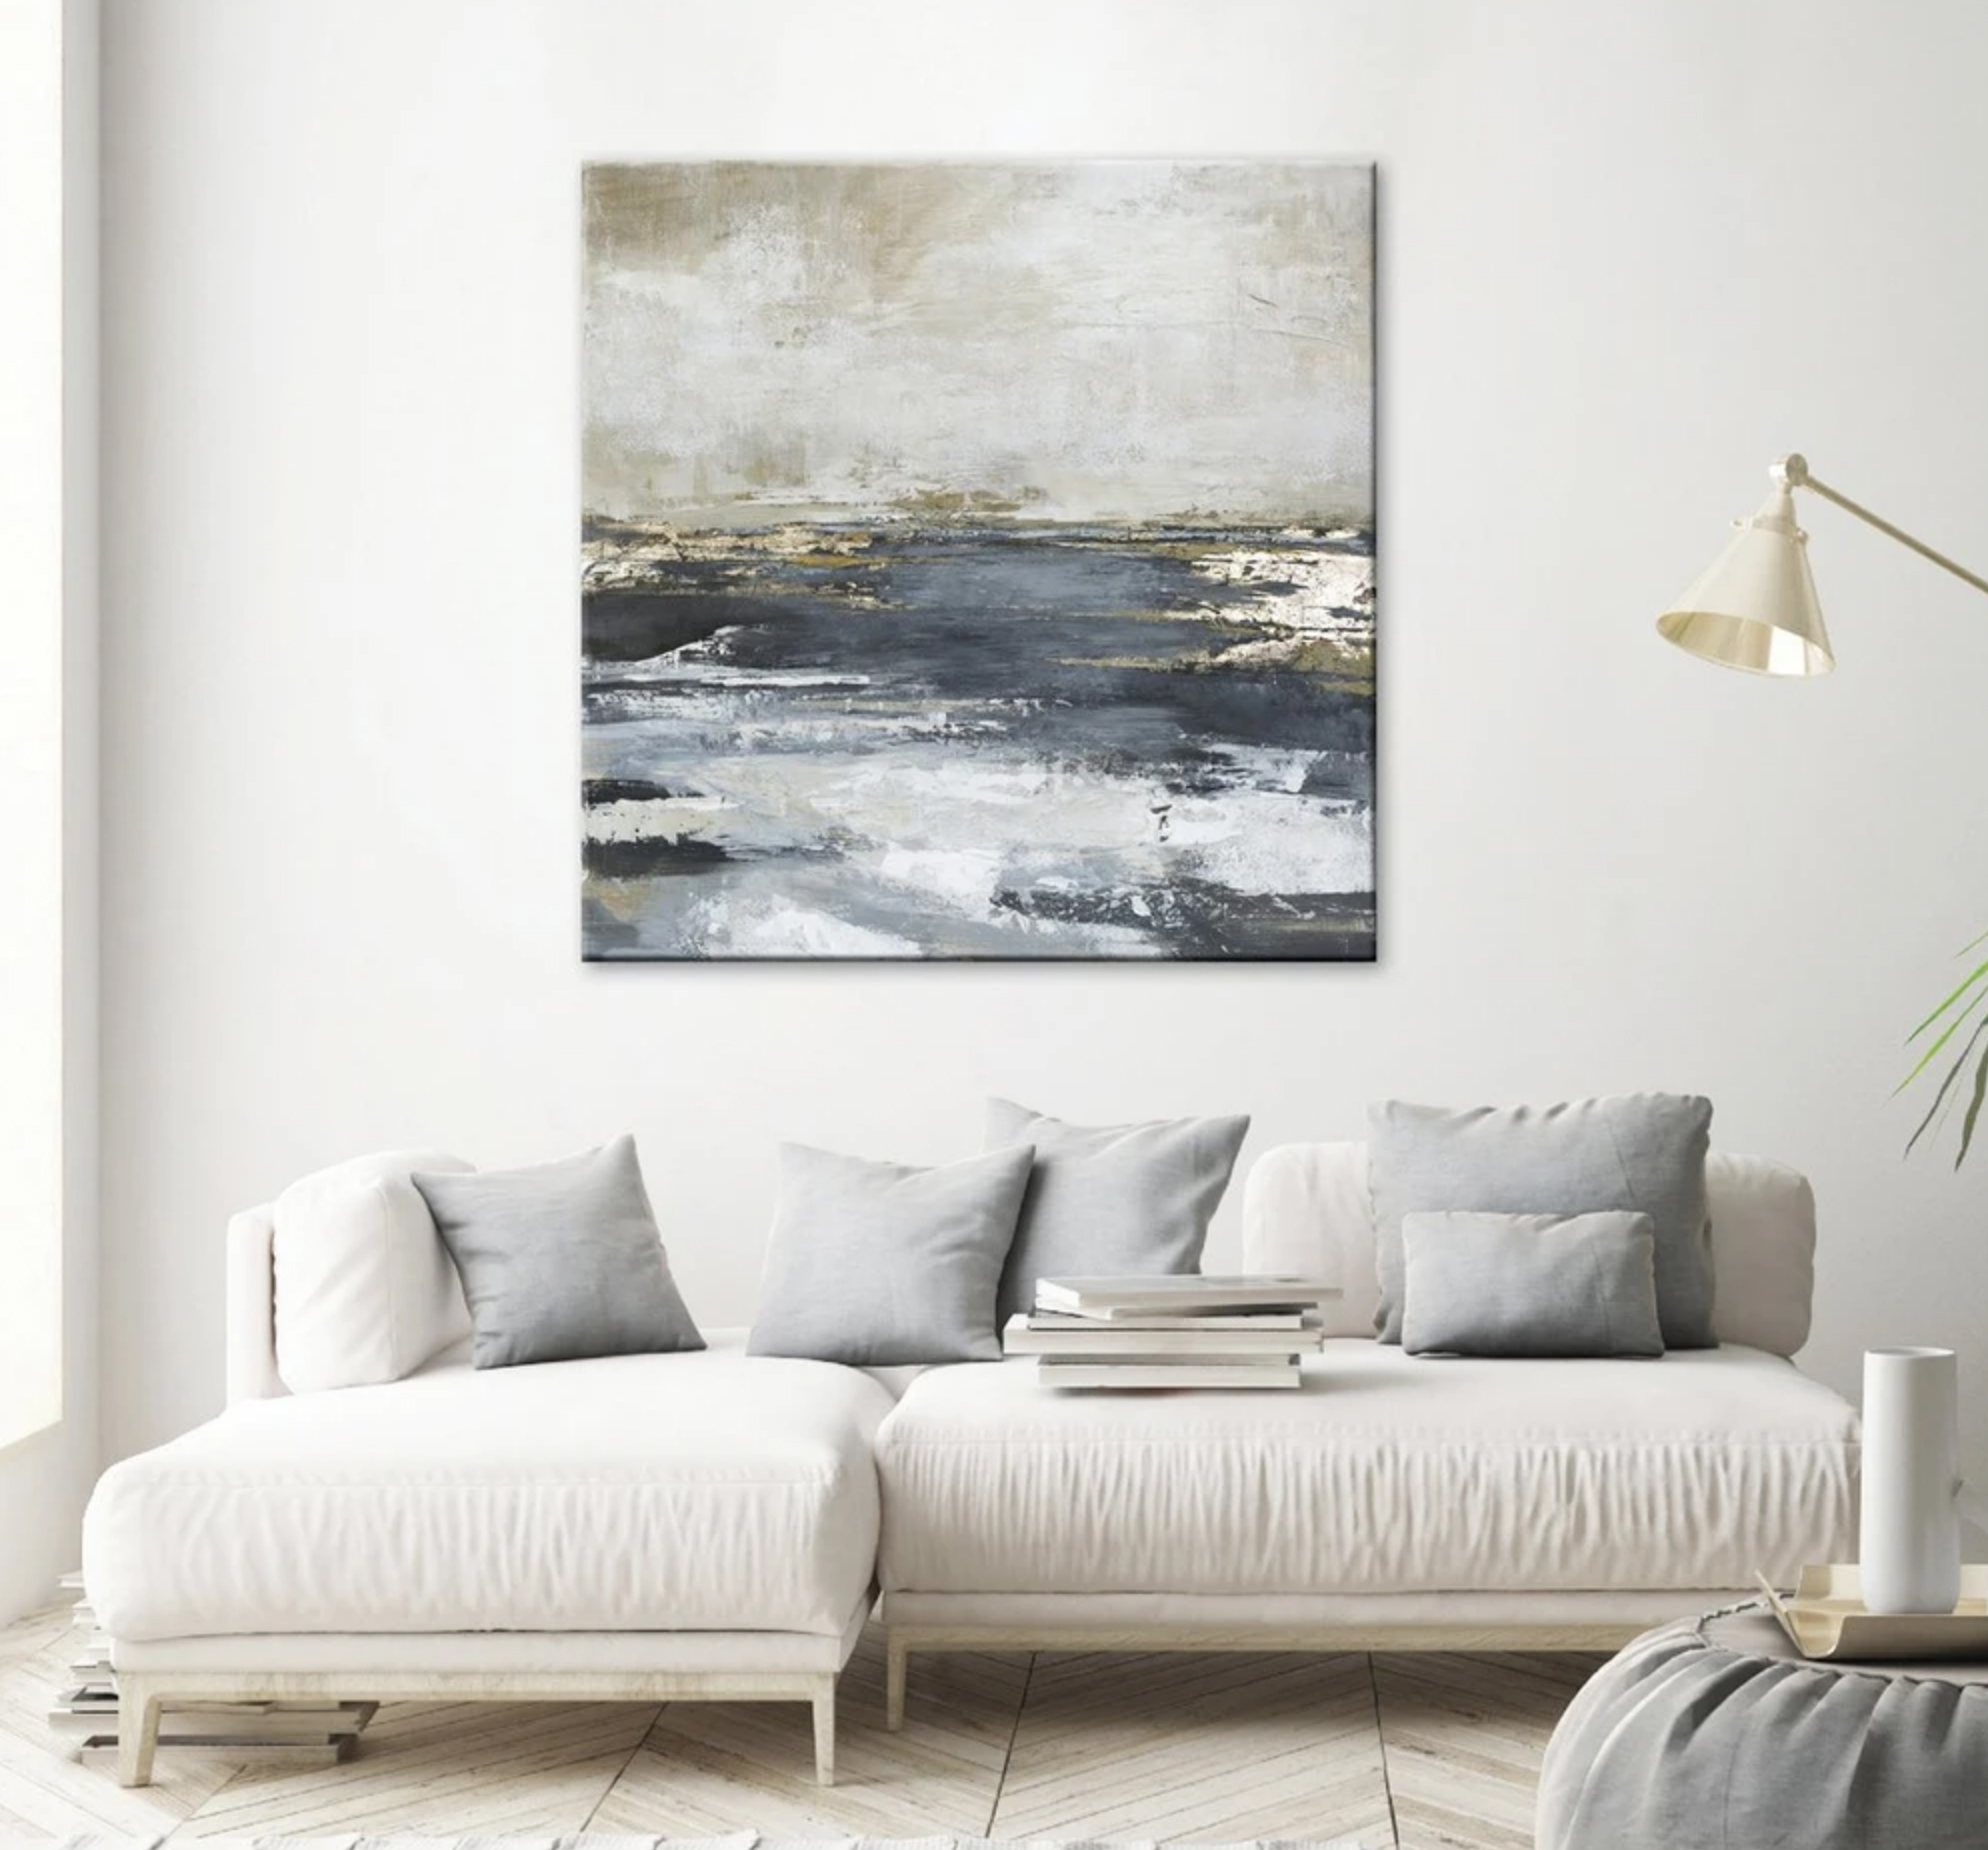 Schilderij Freja Blue Bay 118x118